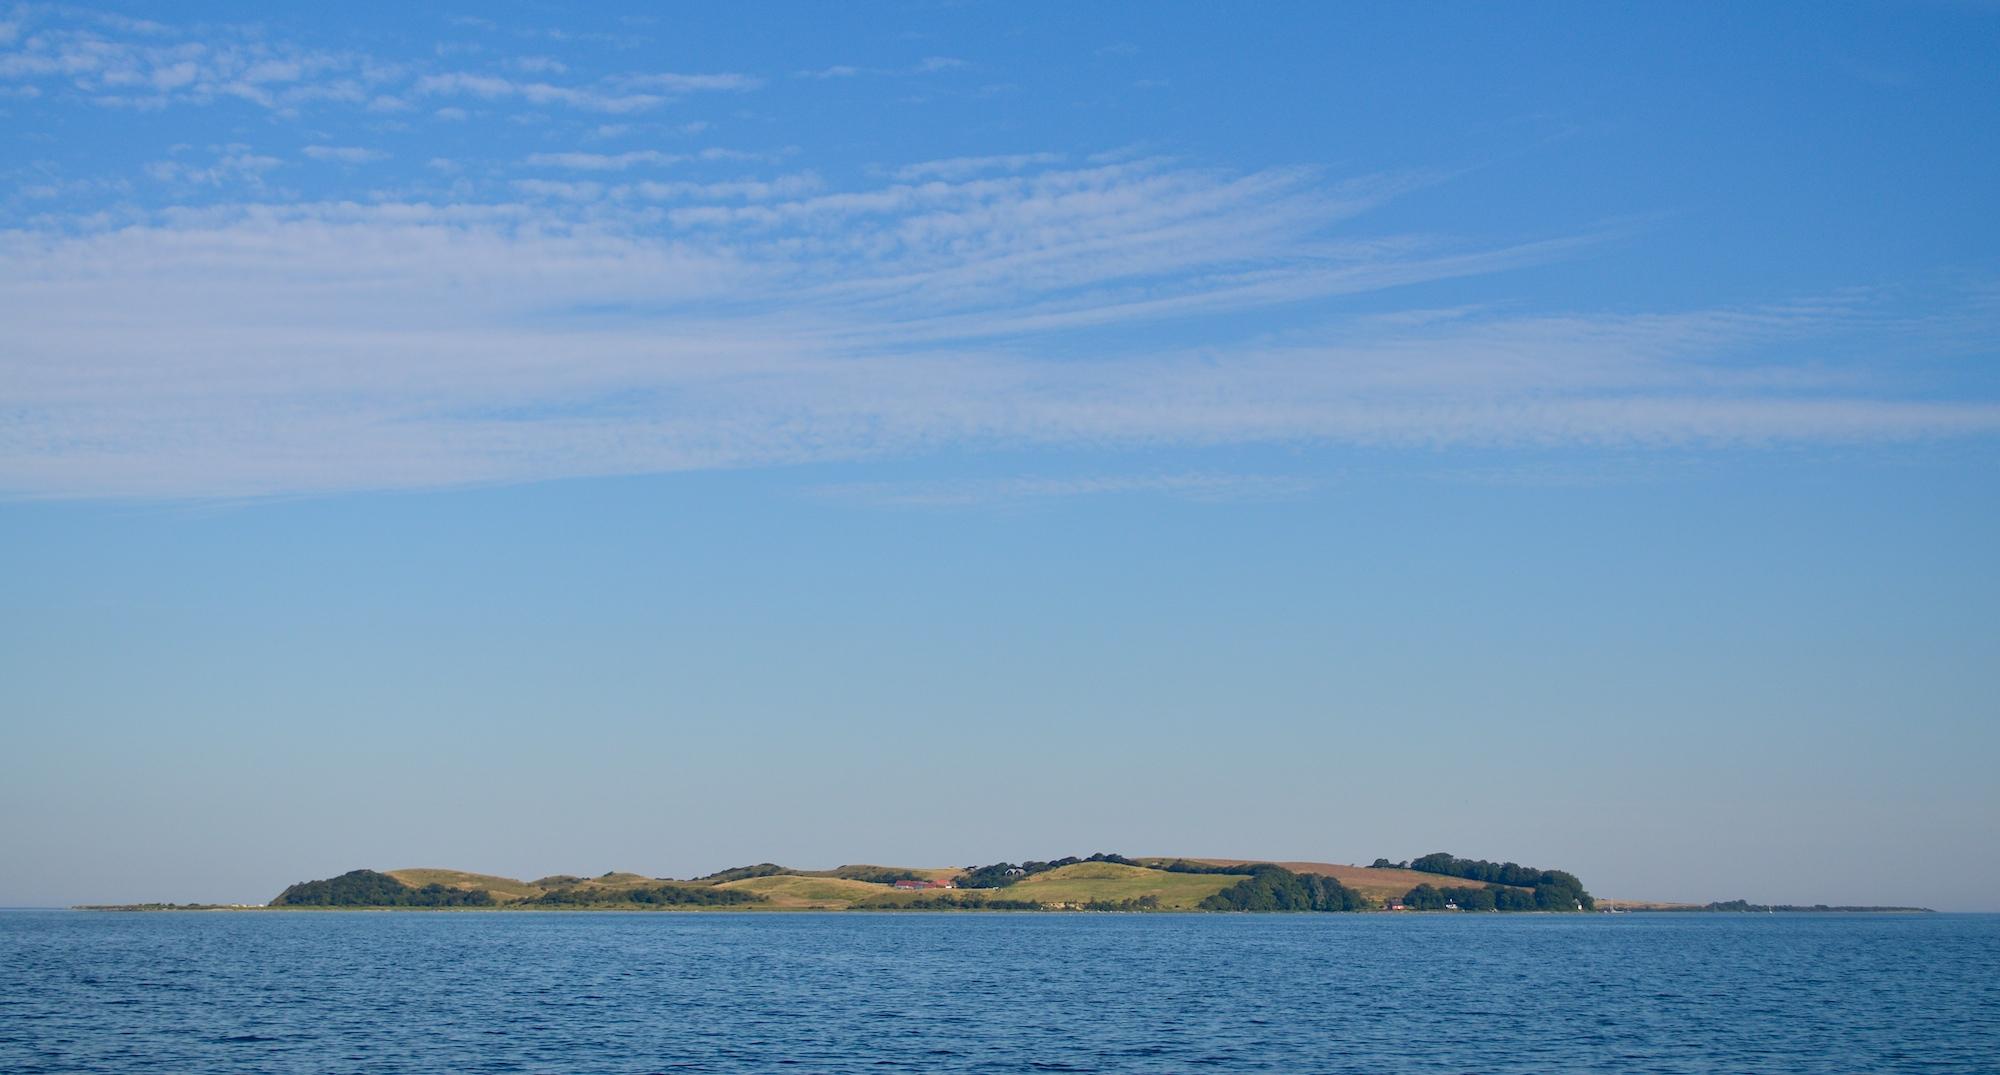 Nekselø (foto: Rune Engelbreth Larsen)